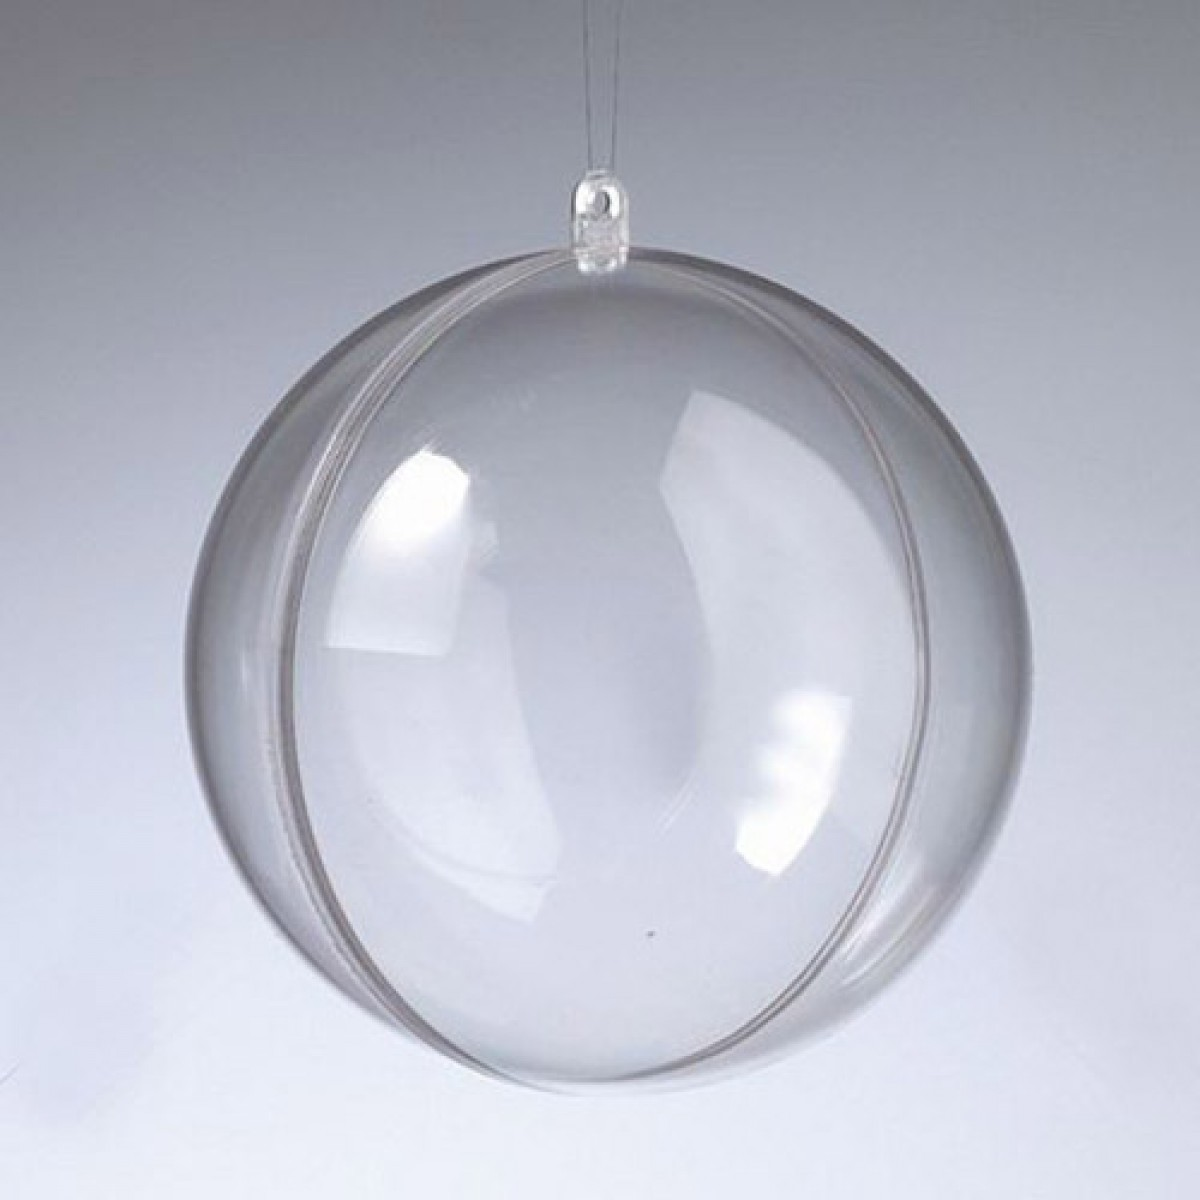 Efco Πλαστική Μπάλα Διάφανη 120mm Υλικά Χειροτεχνίας